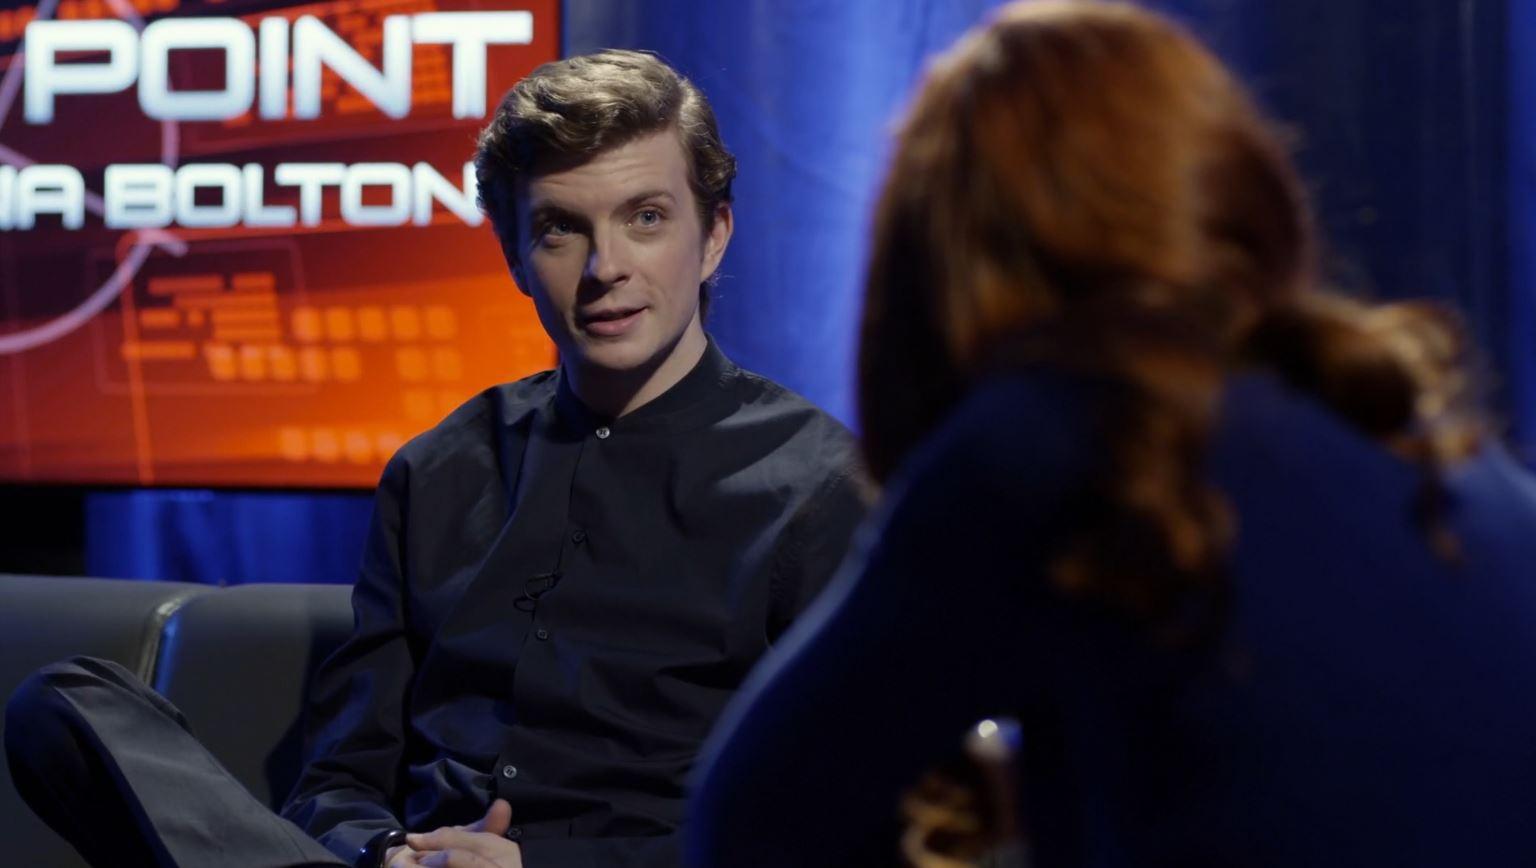 Continuum Season 3 Finale Last Minute Review - Erik Knudsen as Alec Sadler